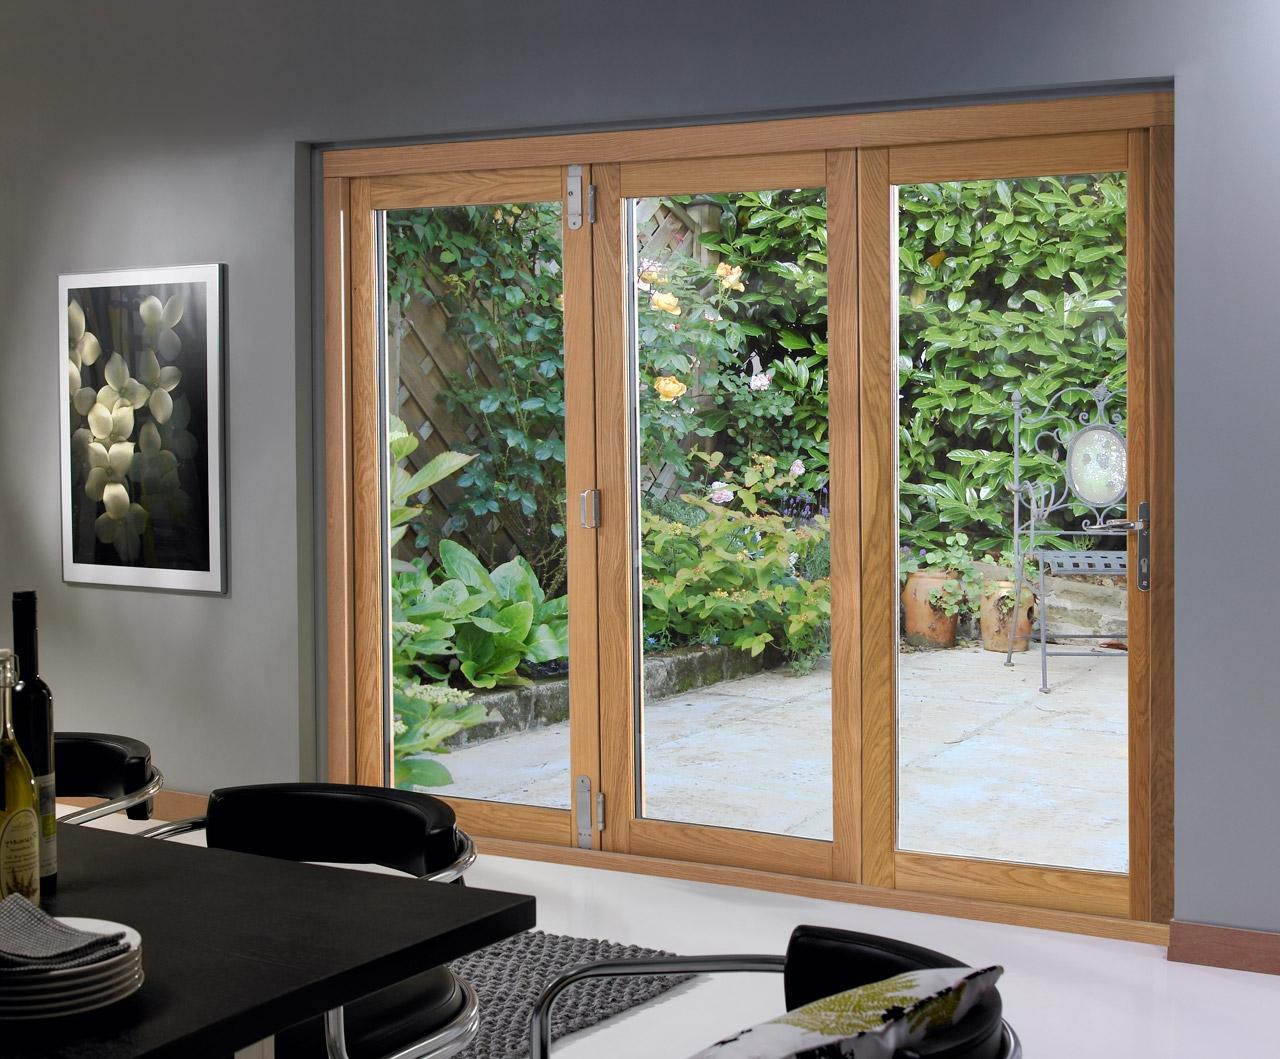 9 Foot Wide Sliding Doors8 foot patio doors home design ideas and pictures